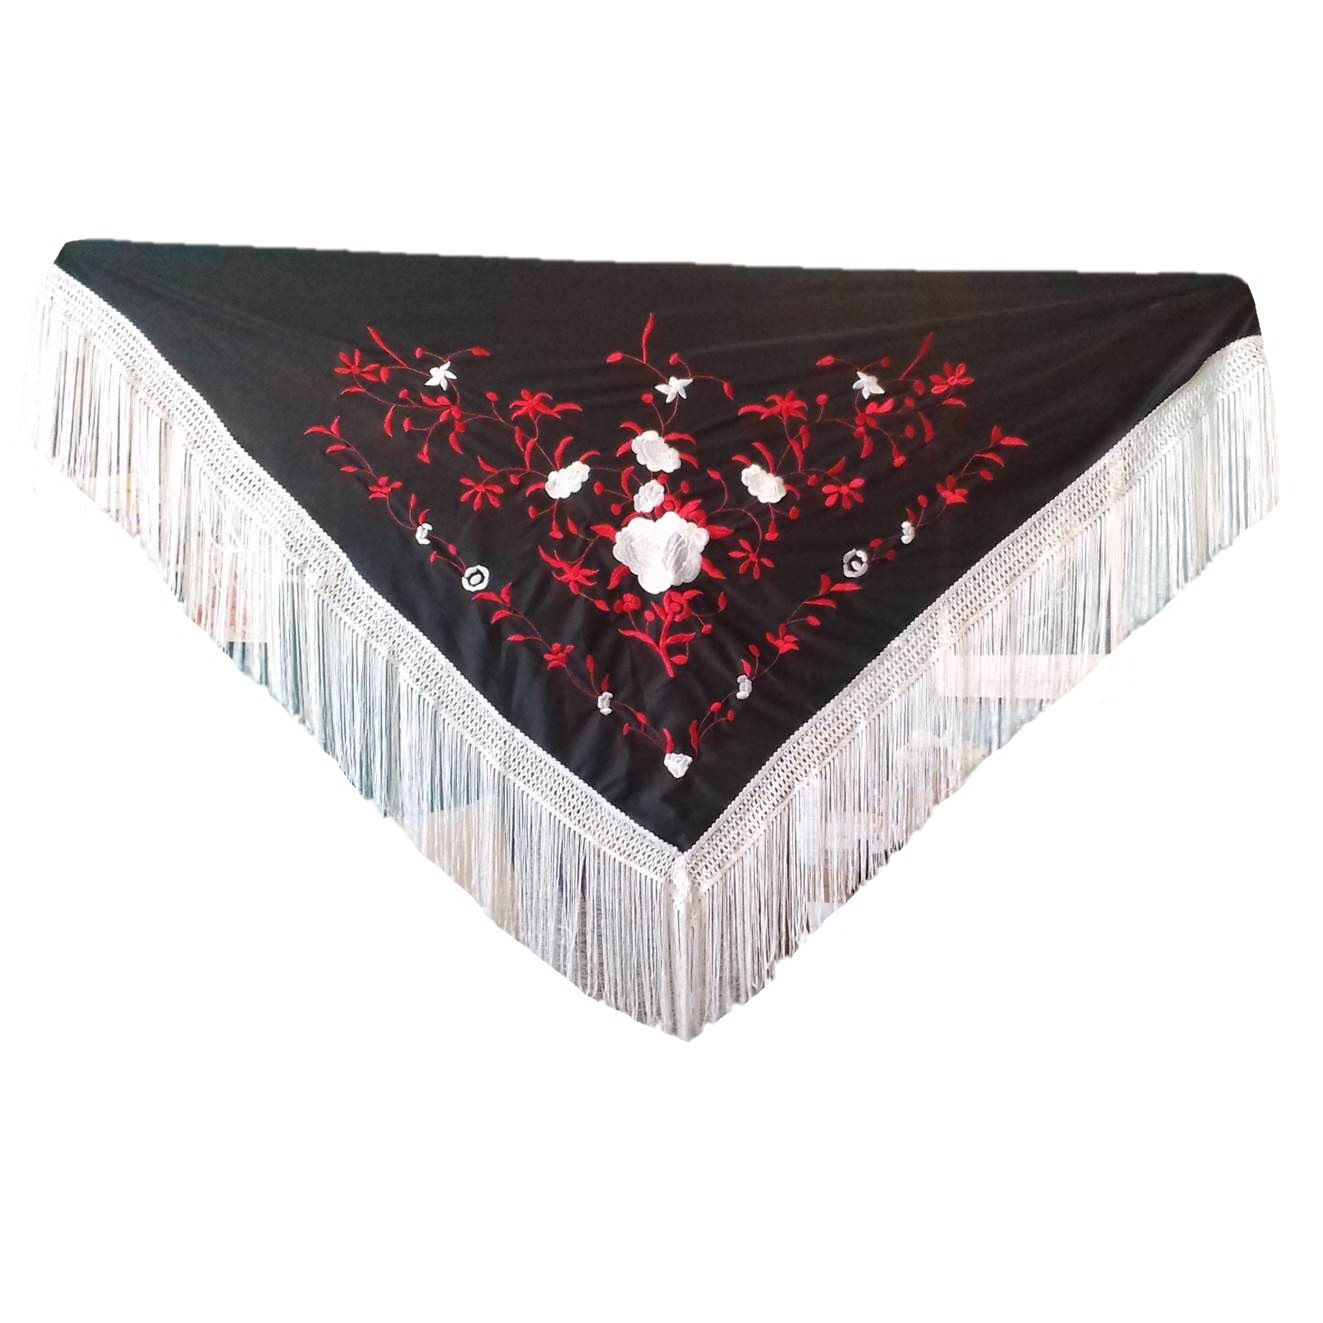 XALE ESPANHOL bordado 160x75 preto branco vermelho flamenco